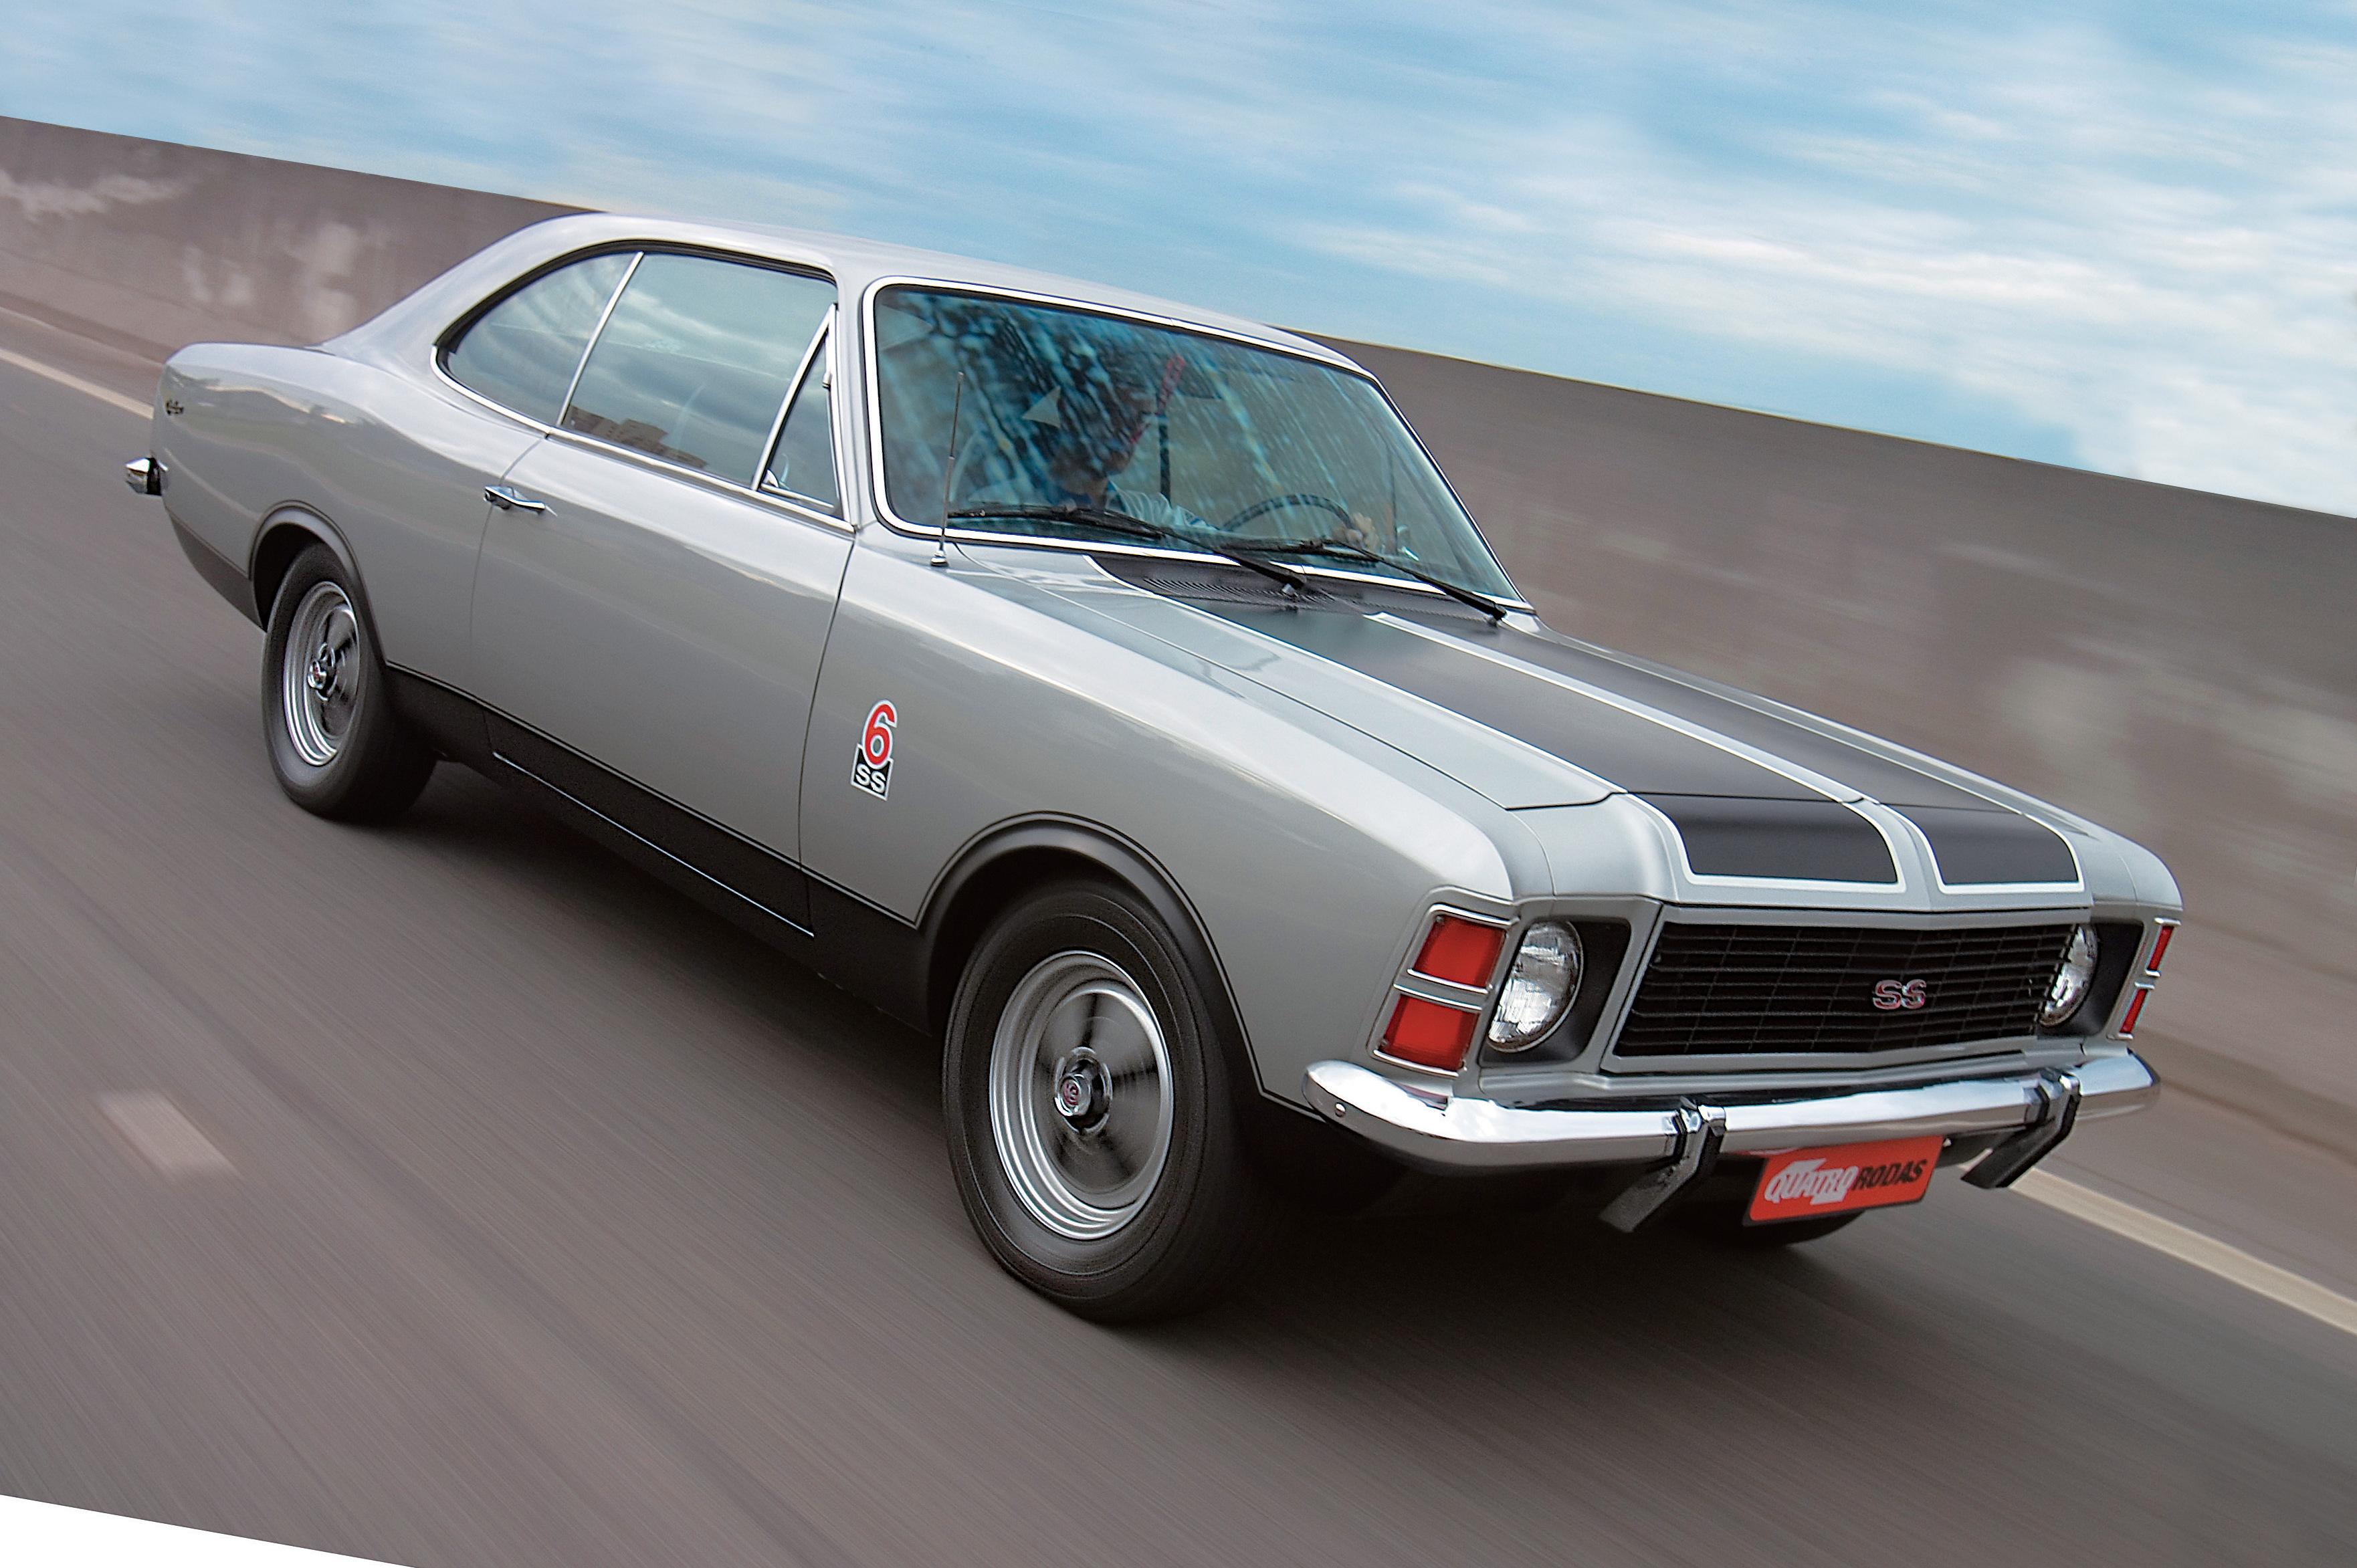 Clássicos Chevrolet Opala SS trouxe esportividade no motor 4.1 e no visual